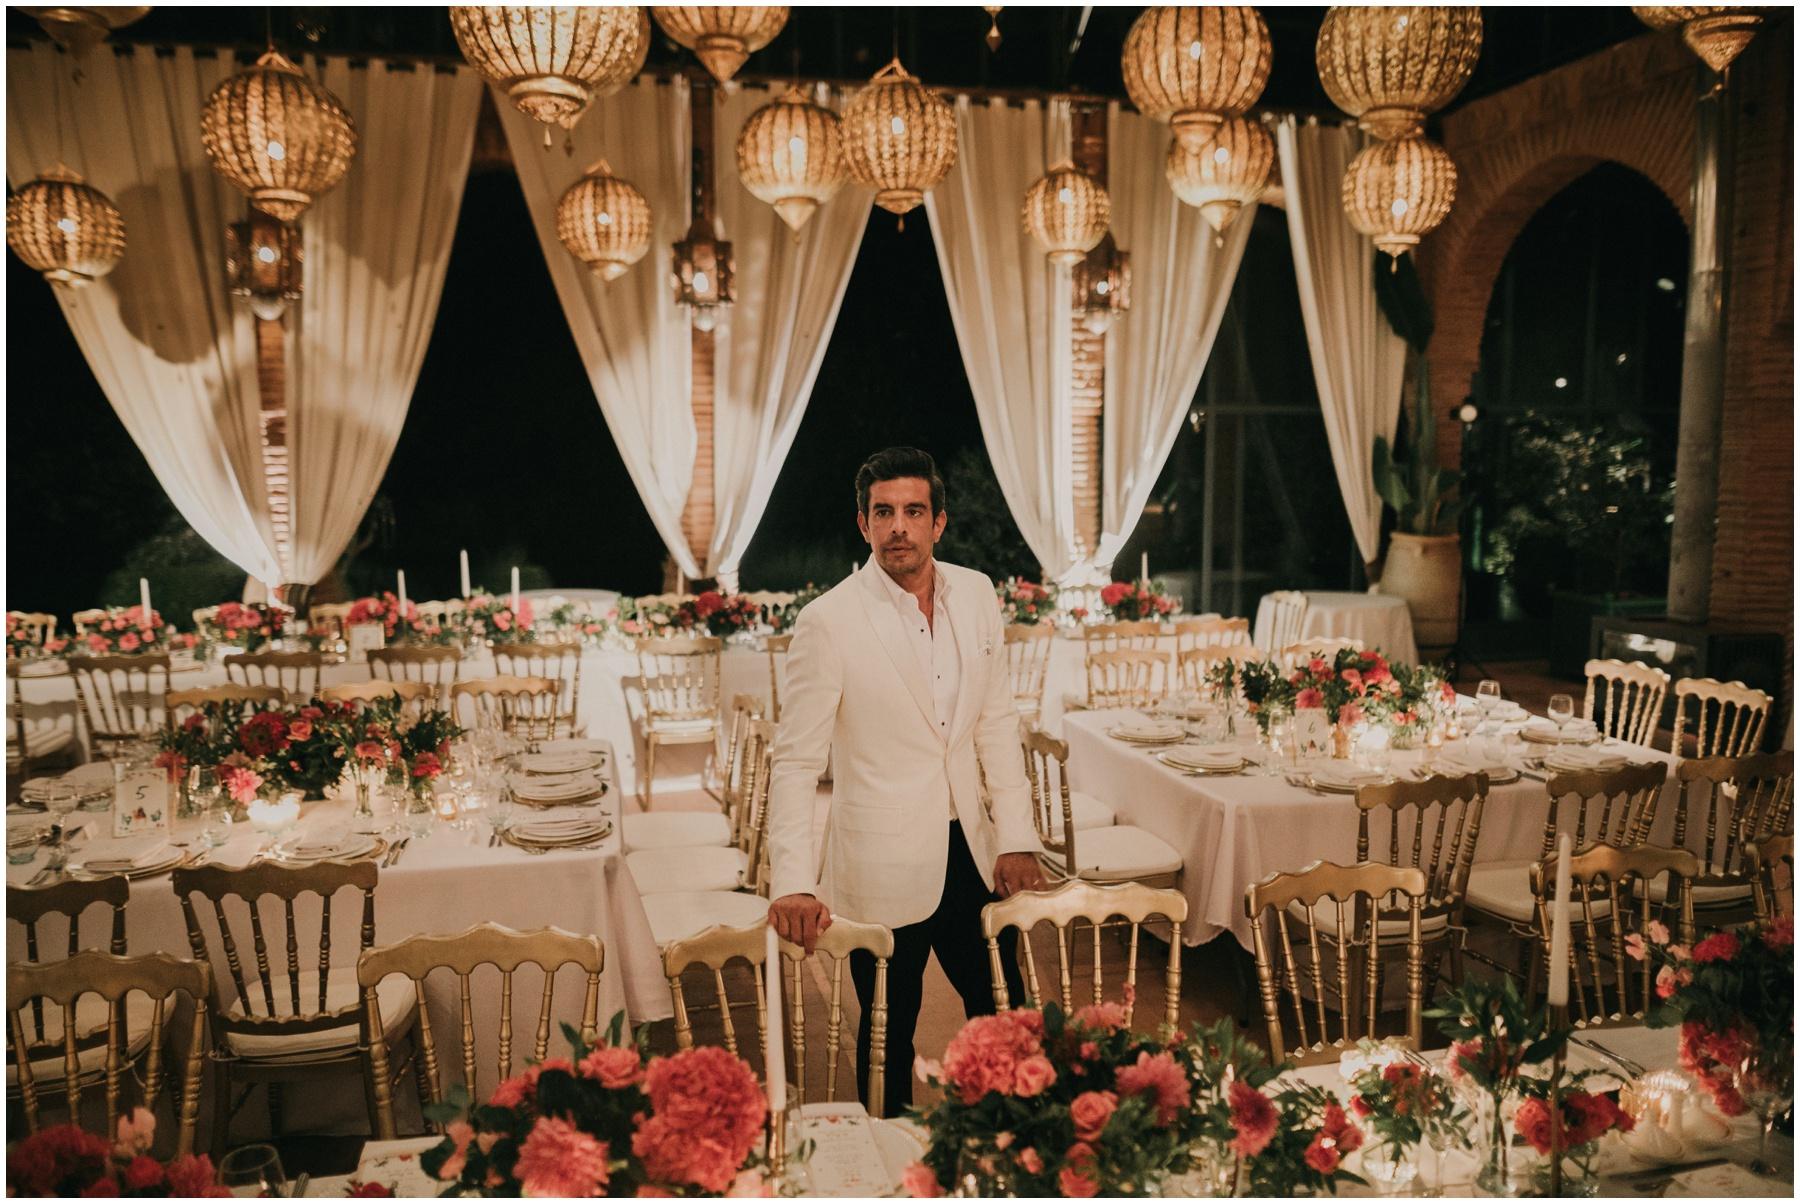 Marrakech Wedding Beldi Coutry Club 070.JPG